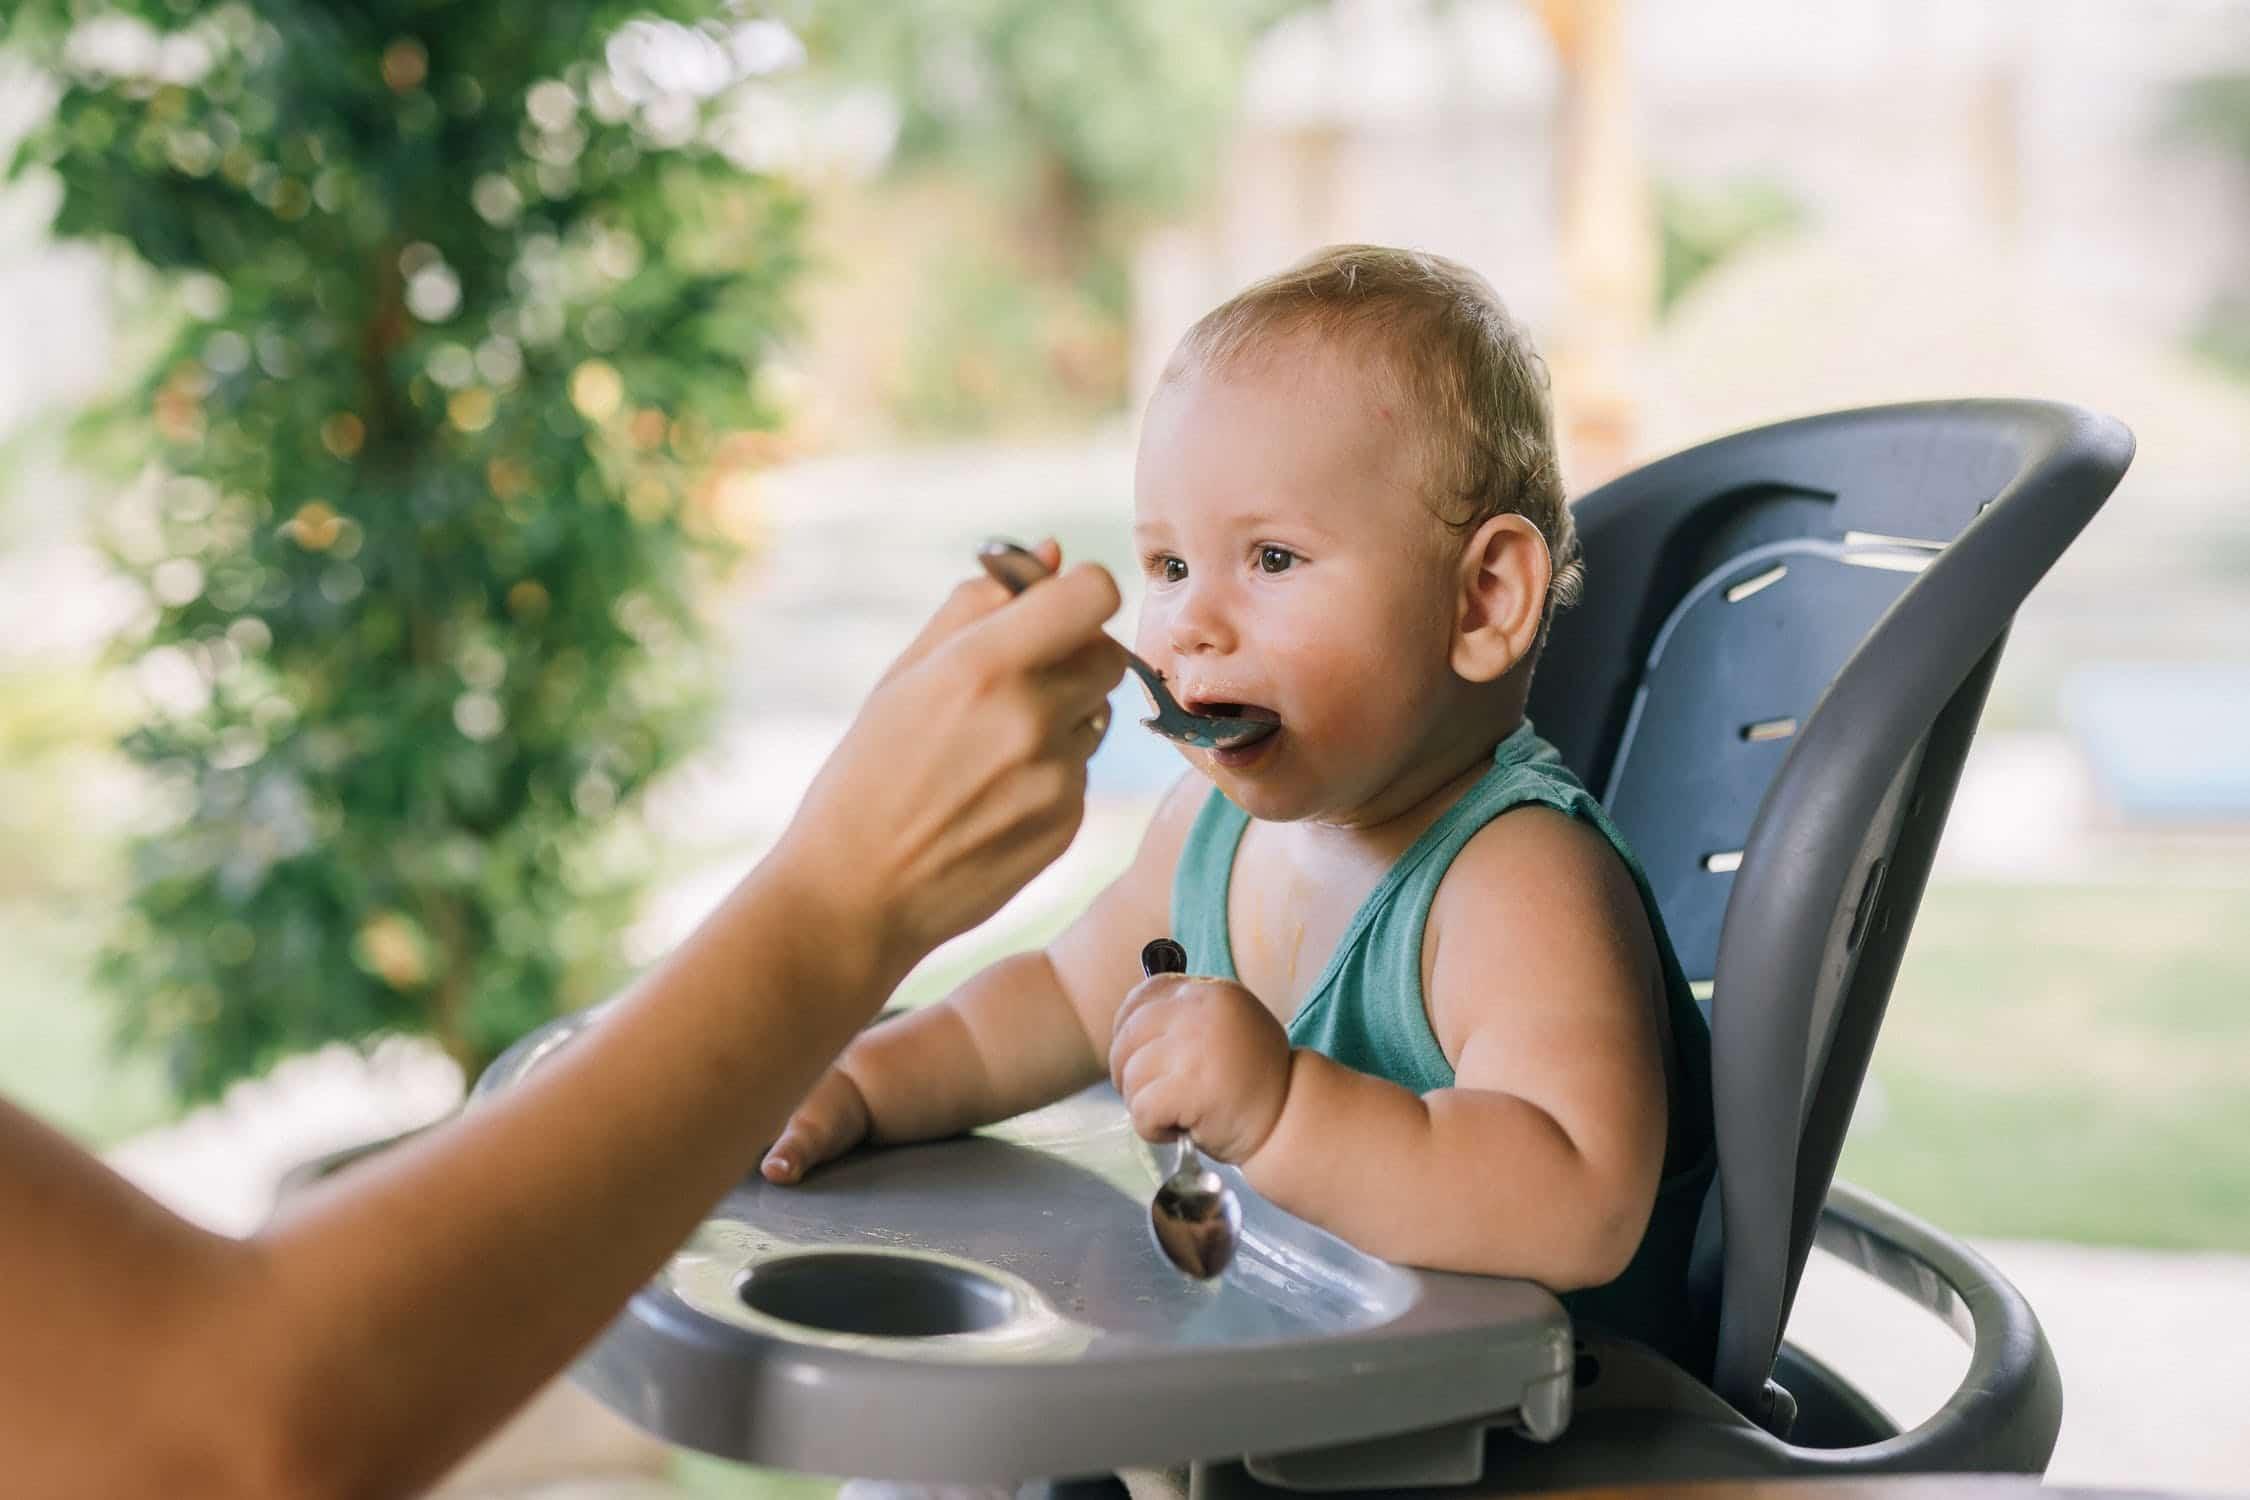 Can babies eat oatmeal?